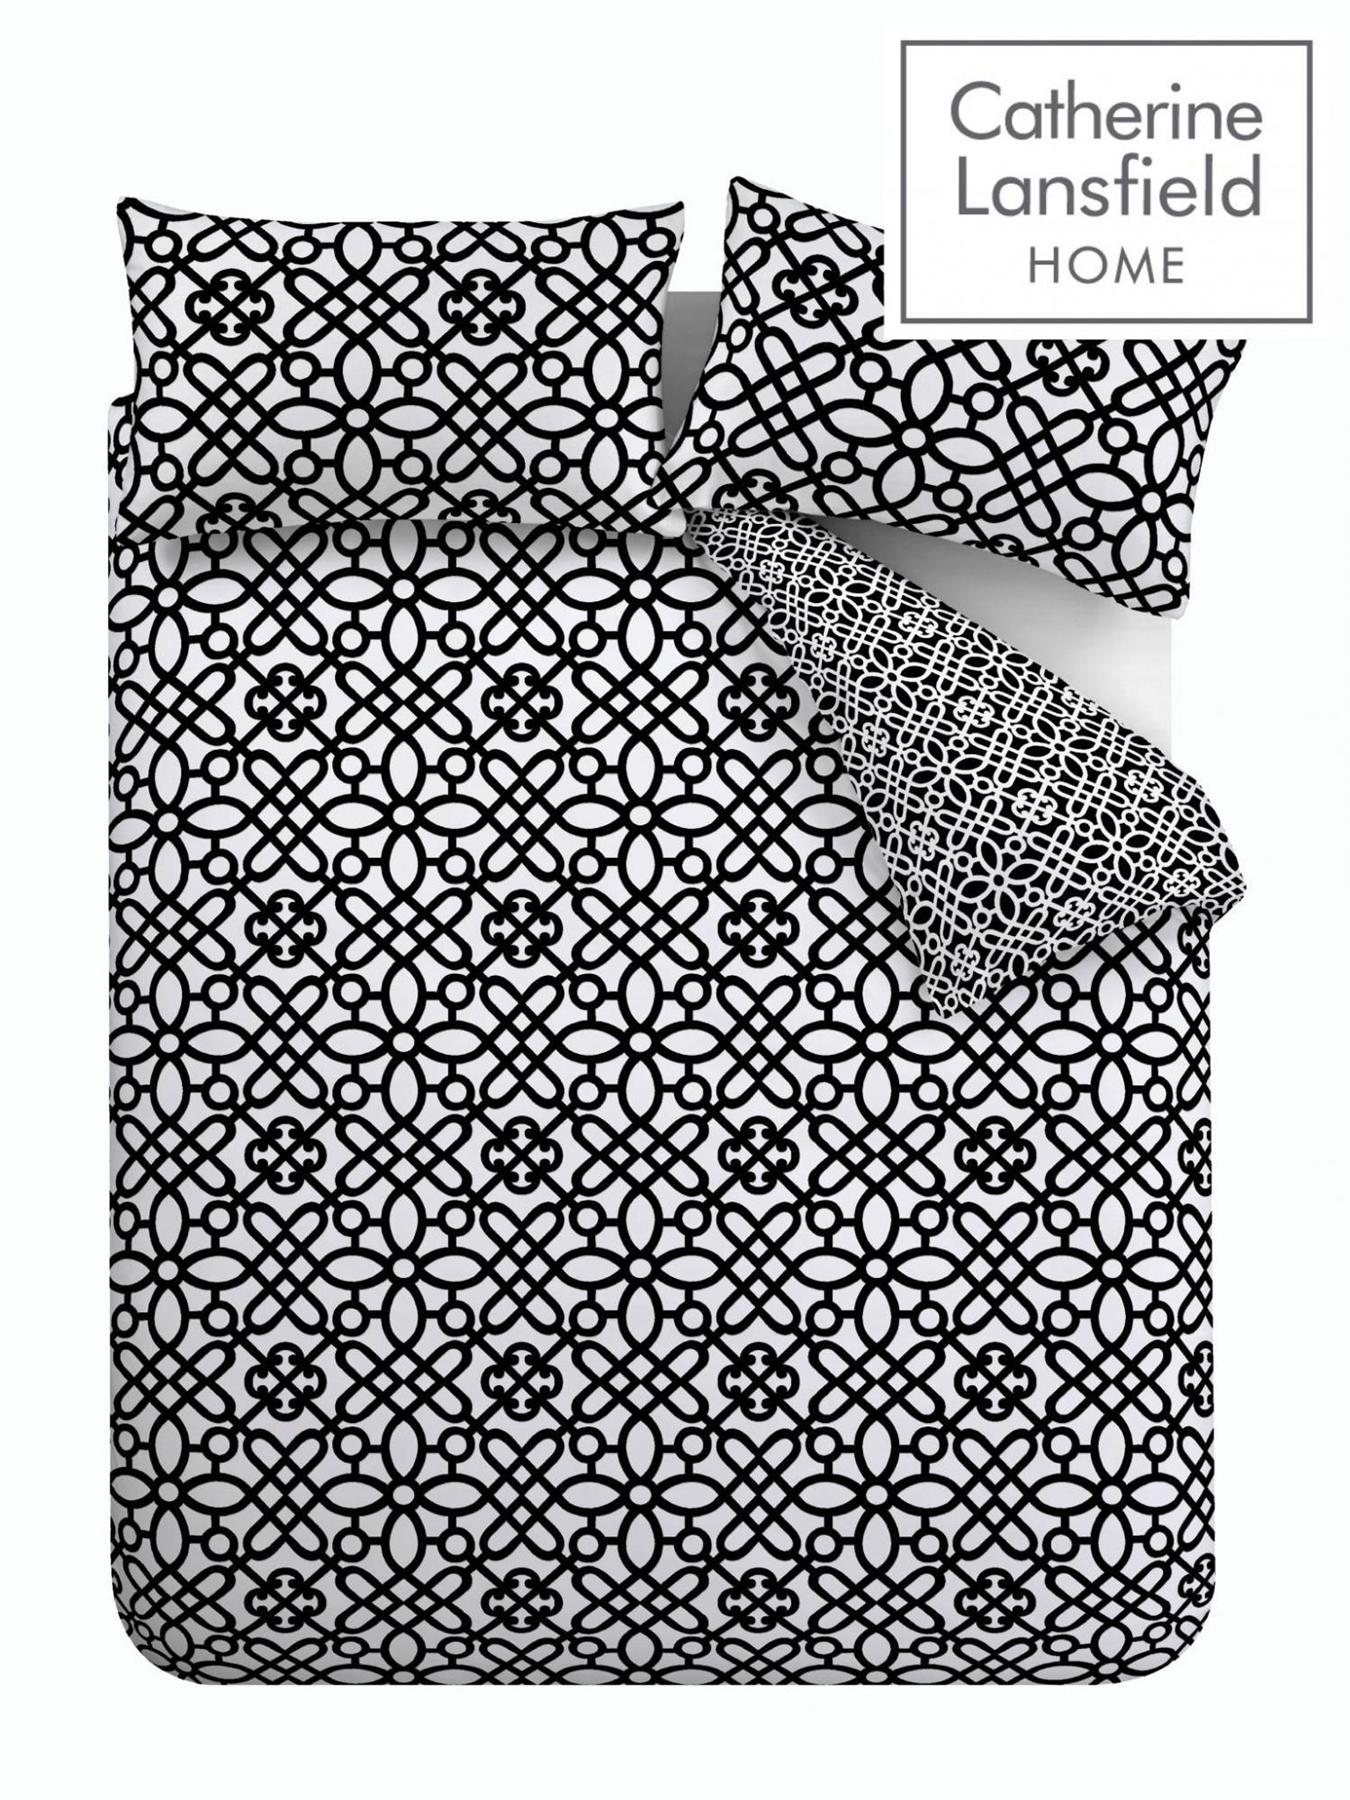 Catherine-Lansfield-Medina-Enrejado-Funda-De-Almohada-Cama-Conjunto-de-Edredon-Negro-Blanco-Casa miniatura 6